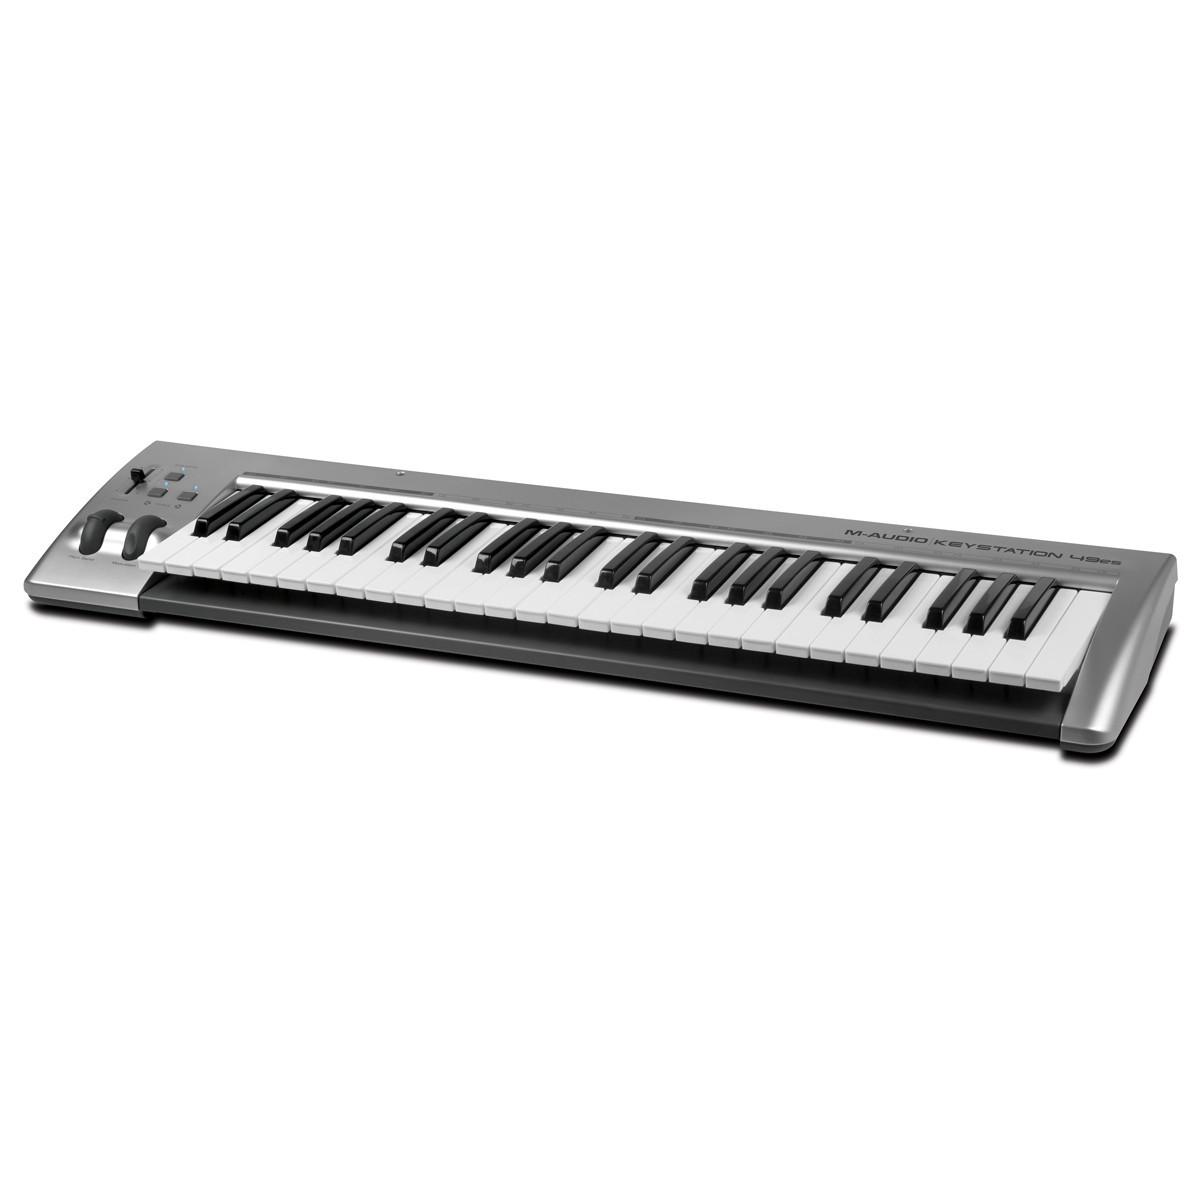 M-Audio Keystation 49es MKII USB MIDI Keyboard